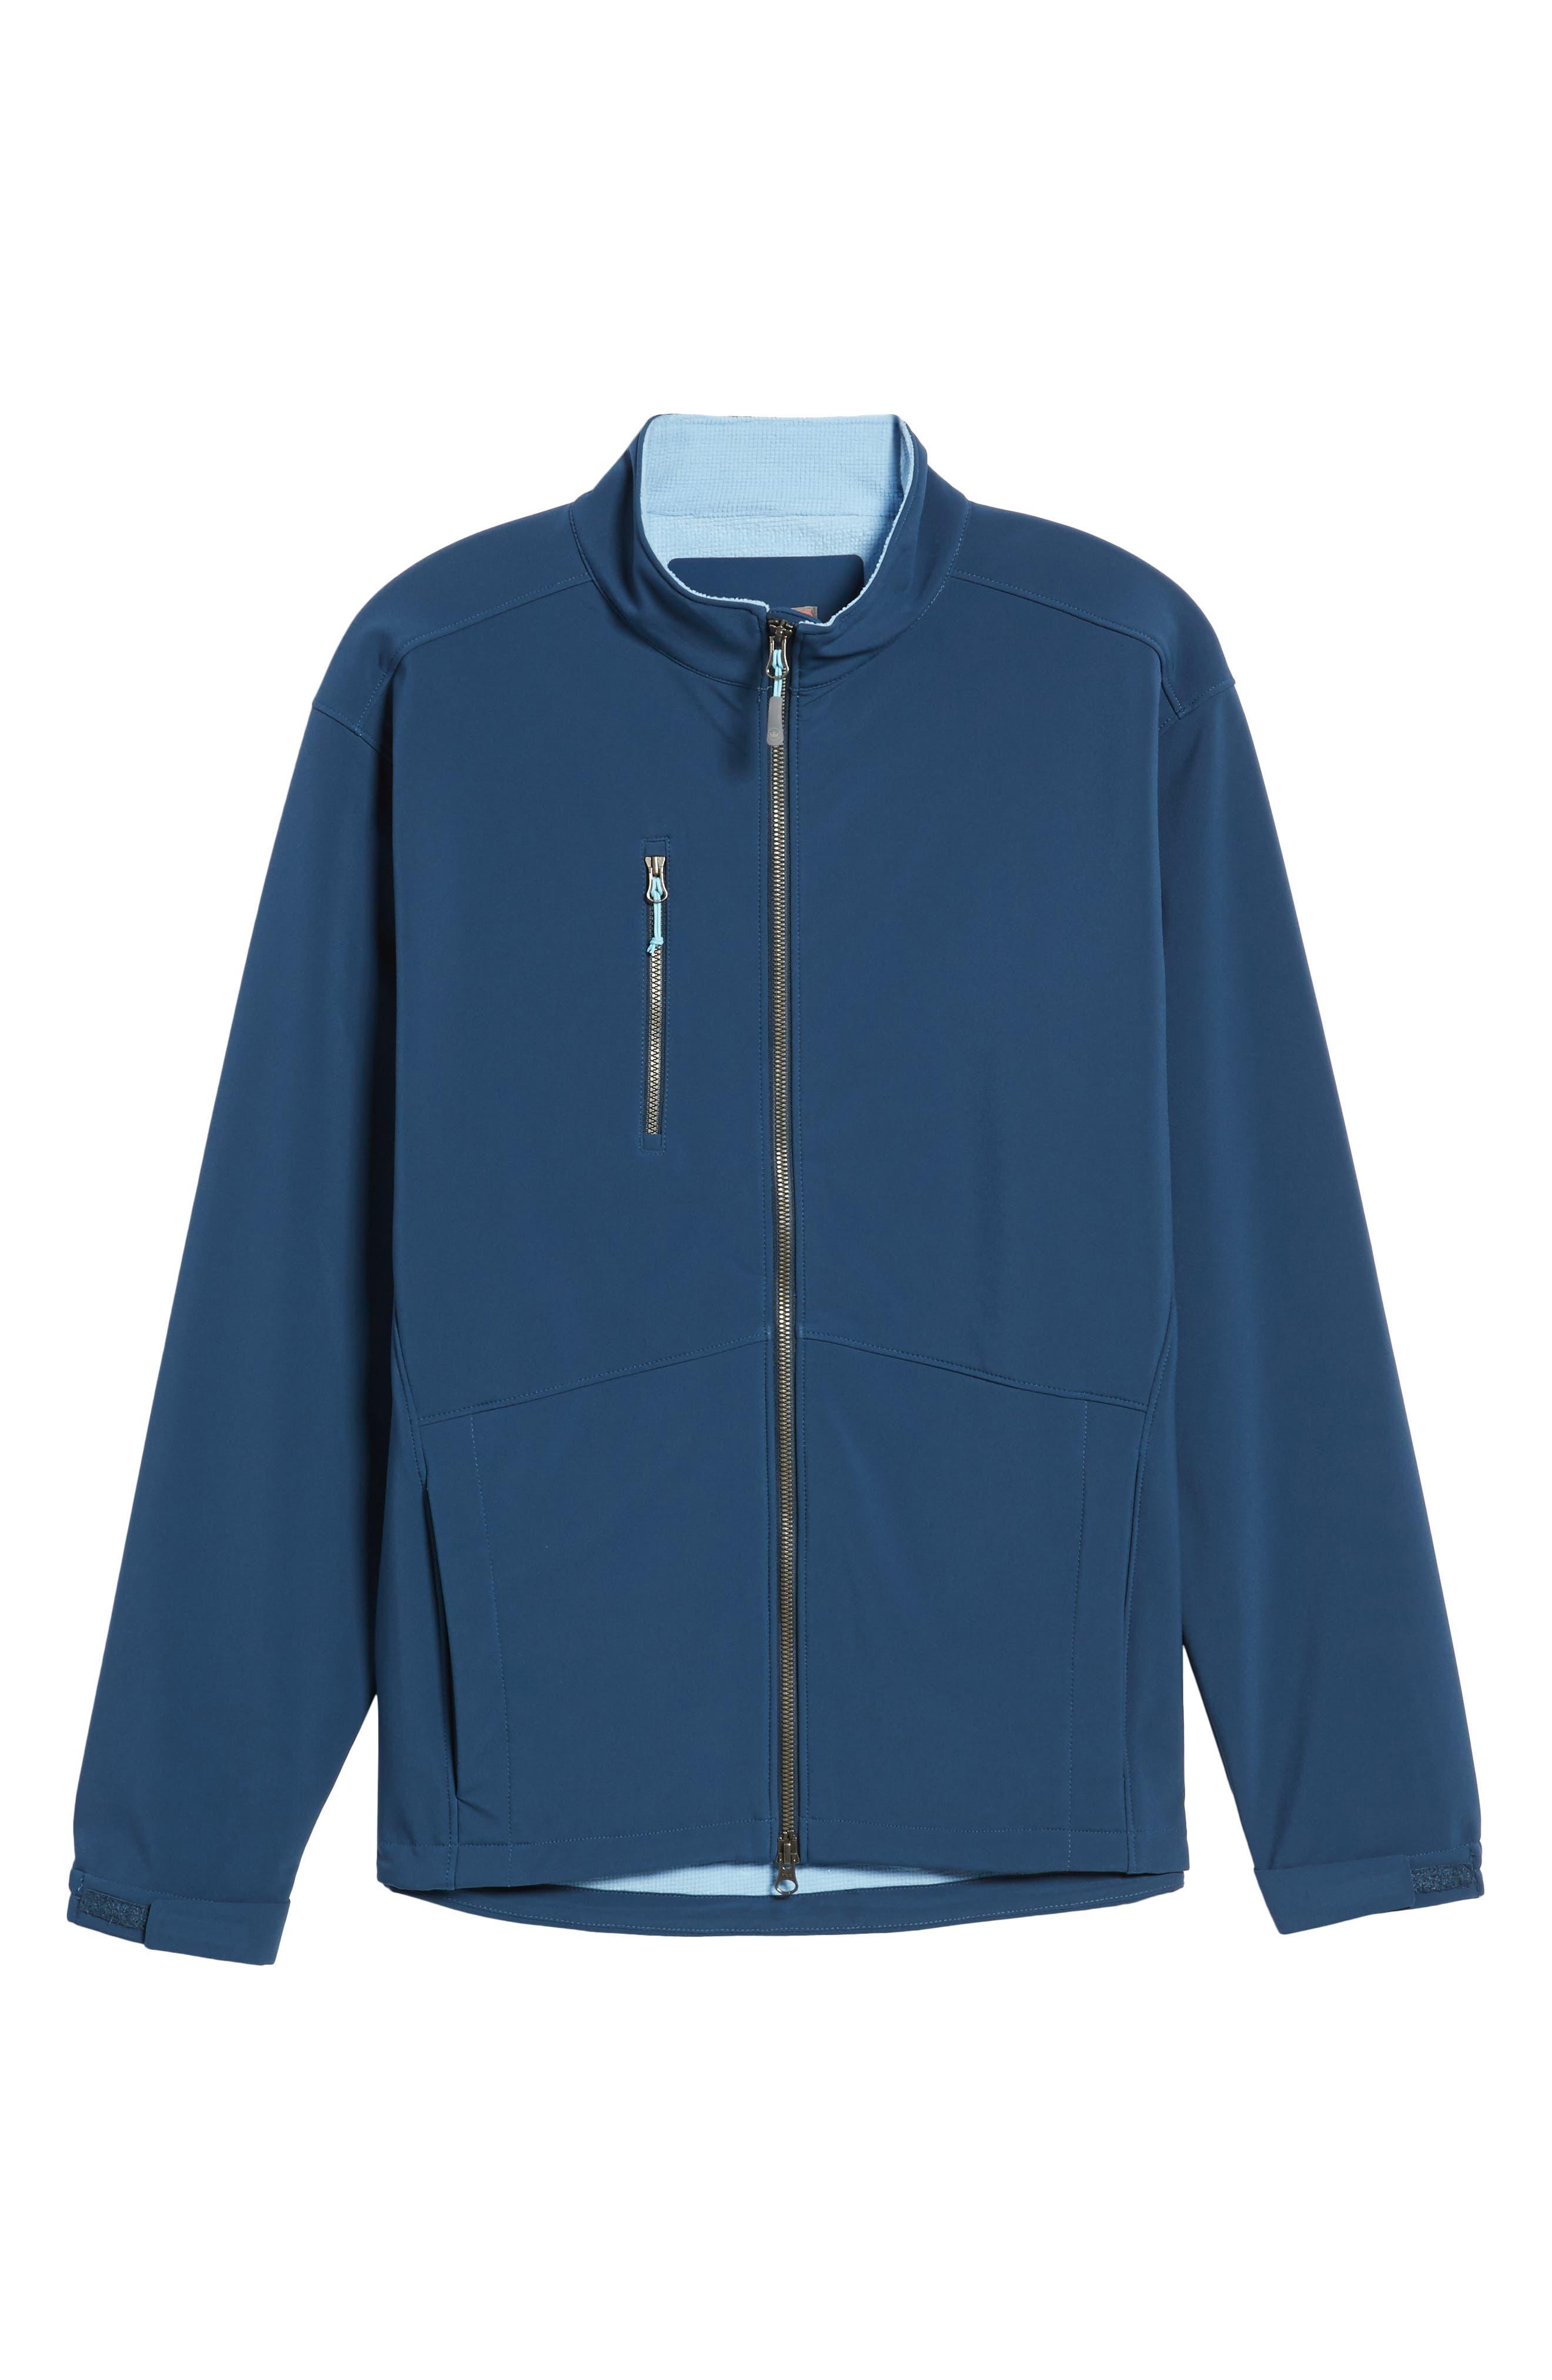 Perth Quarter Zip Stretch Pullover,                             Alternate thumbnail 26, color,